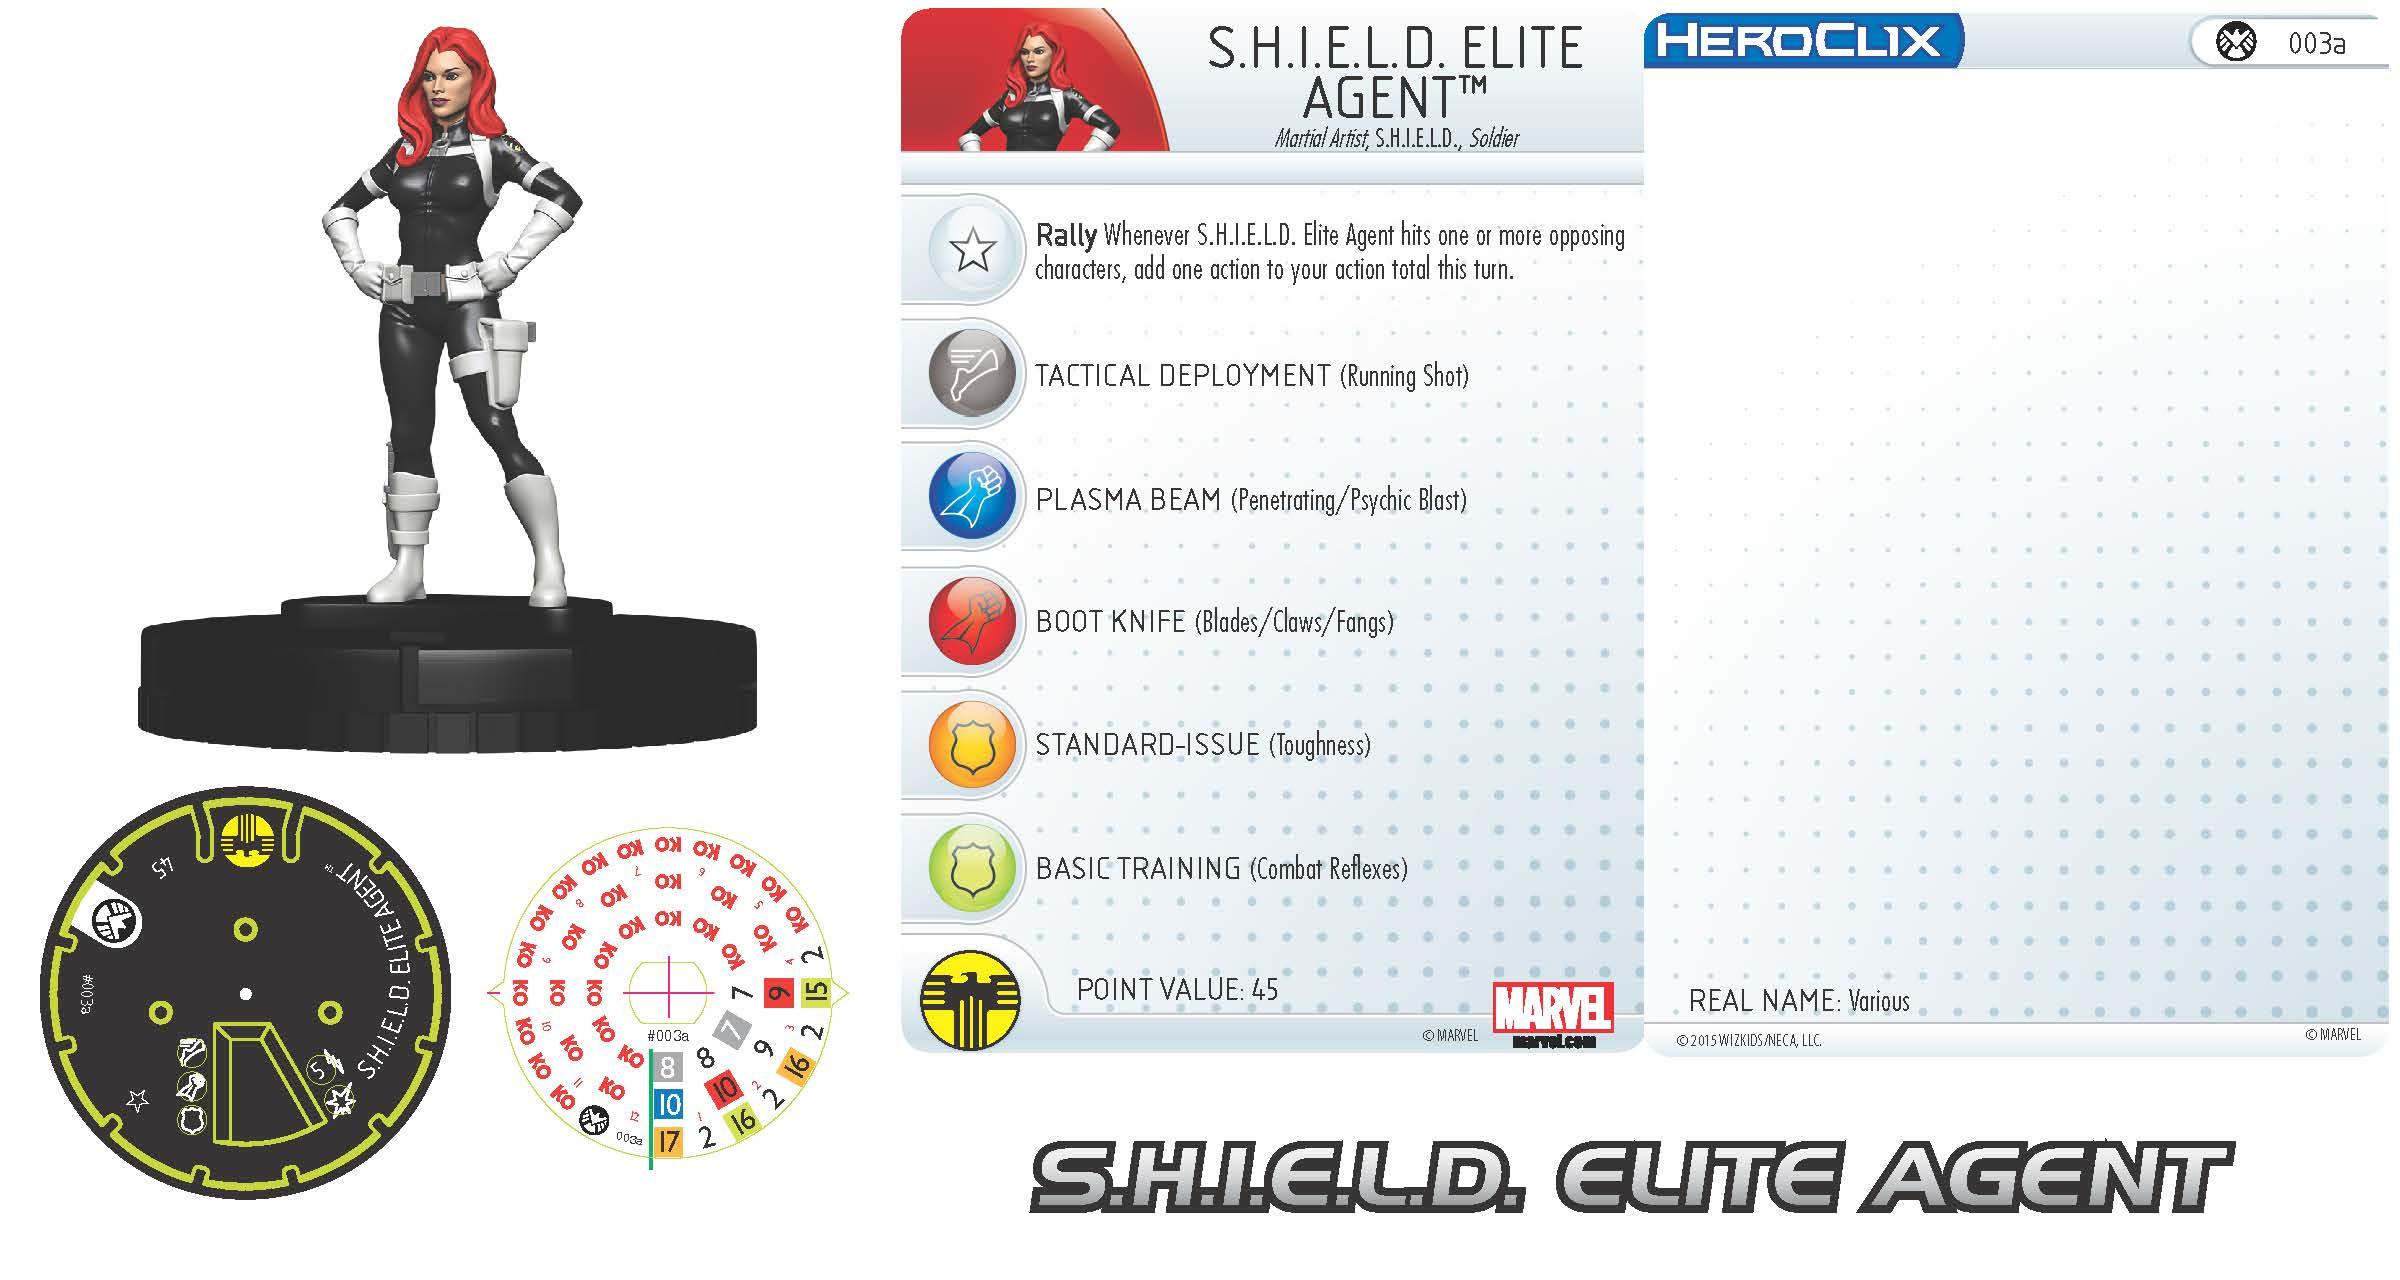 Marvel HeroClix: Nick Fury, Agent of S.H.I.E.L.D.- S.H.I.E.L.D. Elite Agent